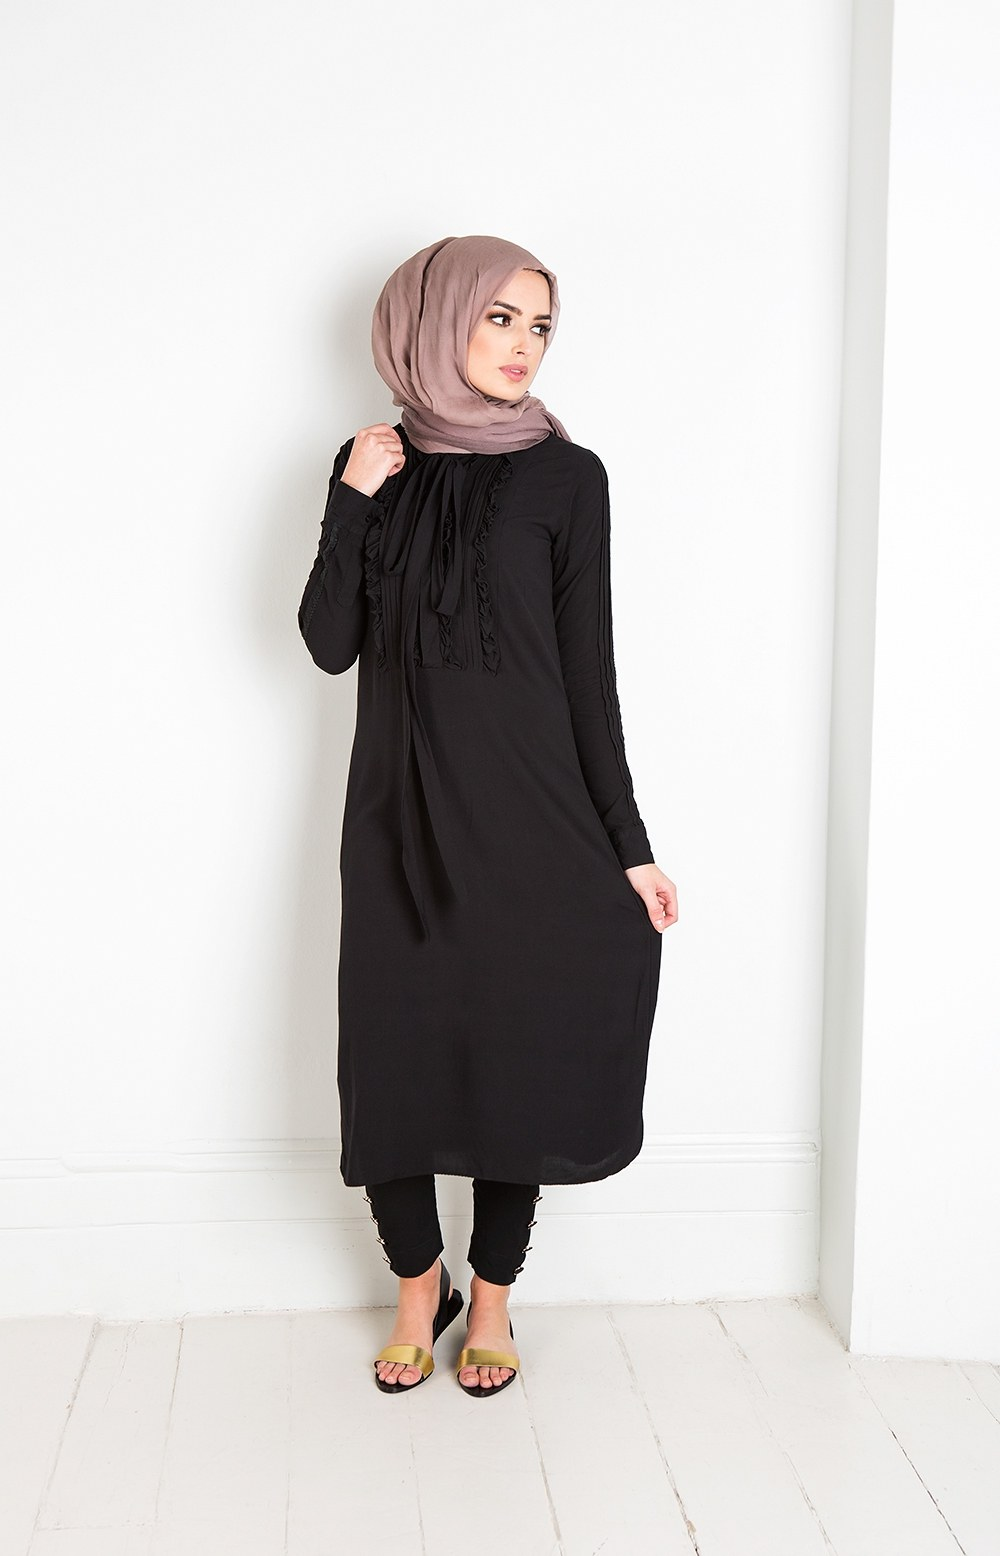 Inspirasi Model Baju Lebaran Tahun 2018 Nkde 25 Trend Model Baju Muslim Lebaran 2018 Simple & Modis